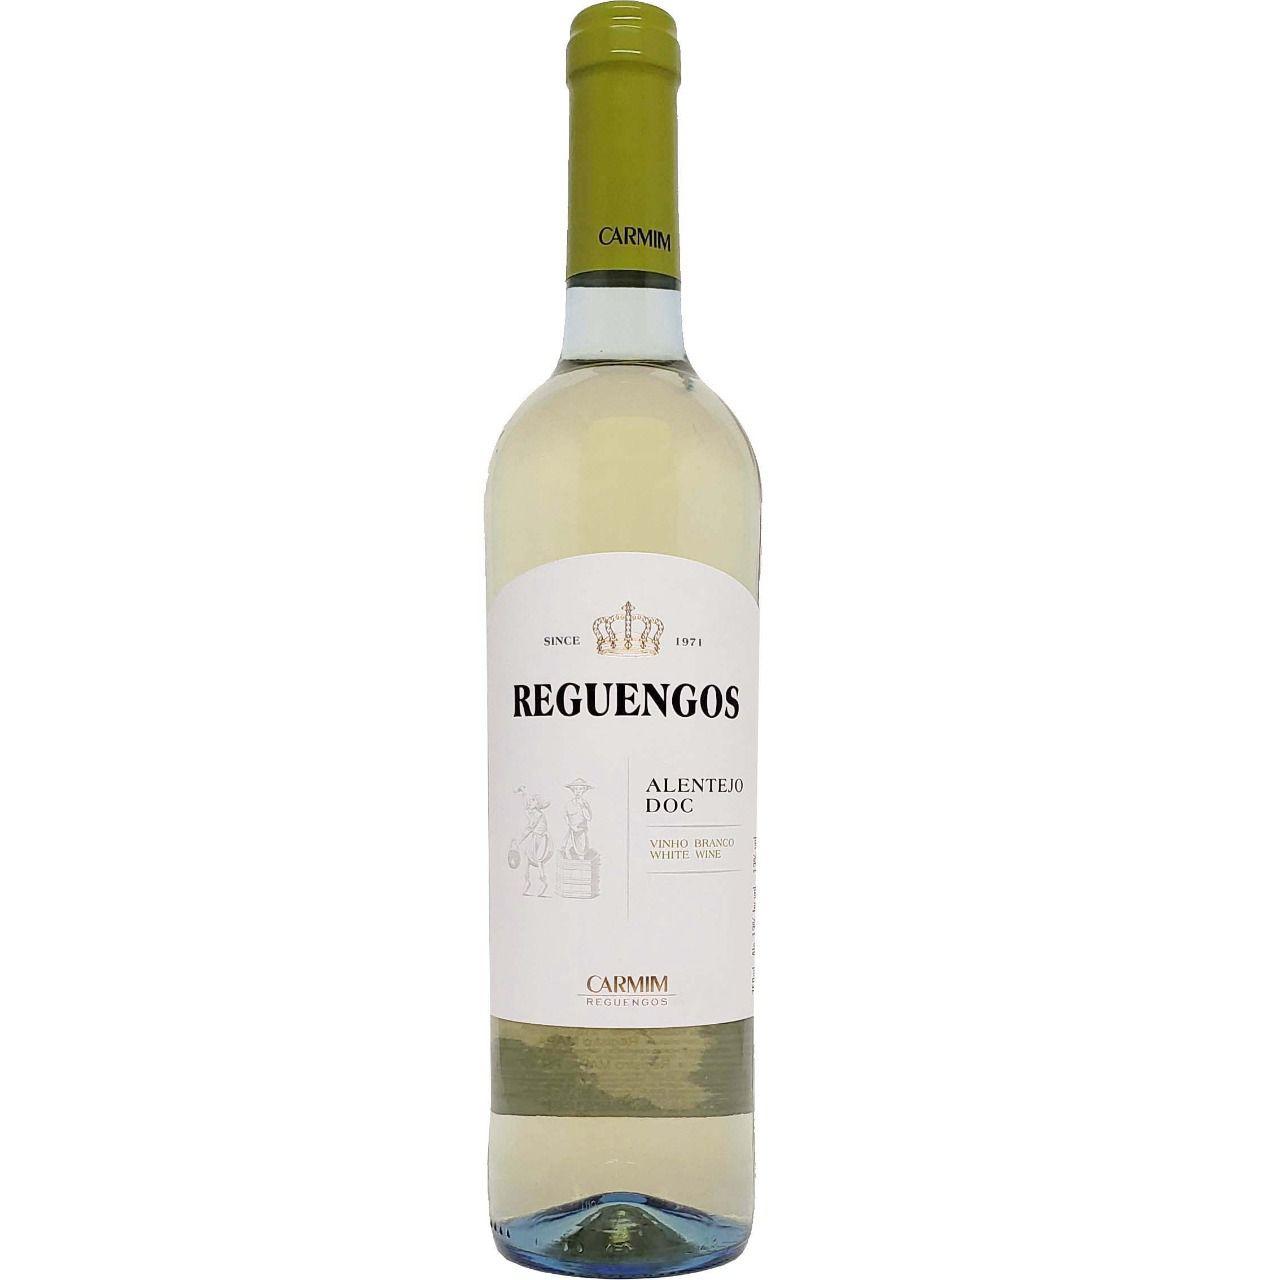 Vinho Branco Reguengos Alentejo DOC Carmim - 750ml -